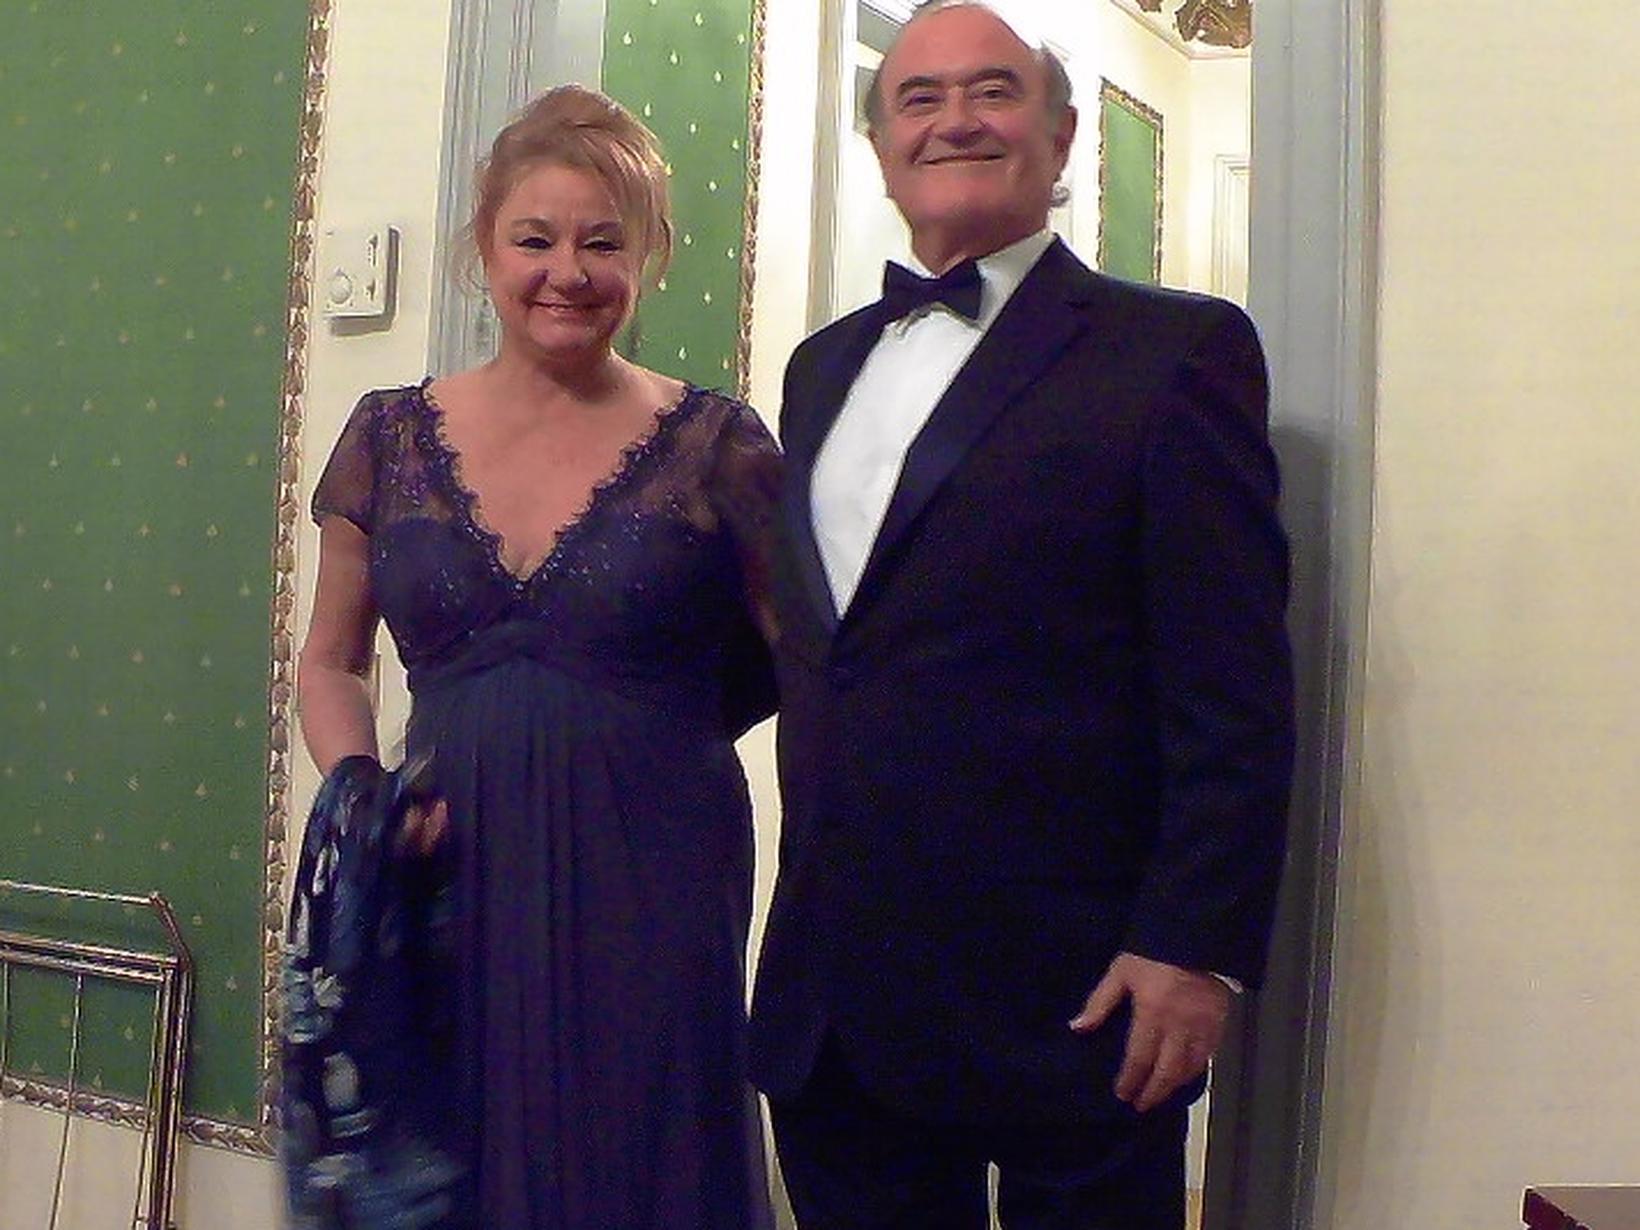 Isabel & Antonio from Marbella, Spain